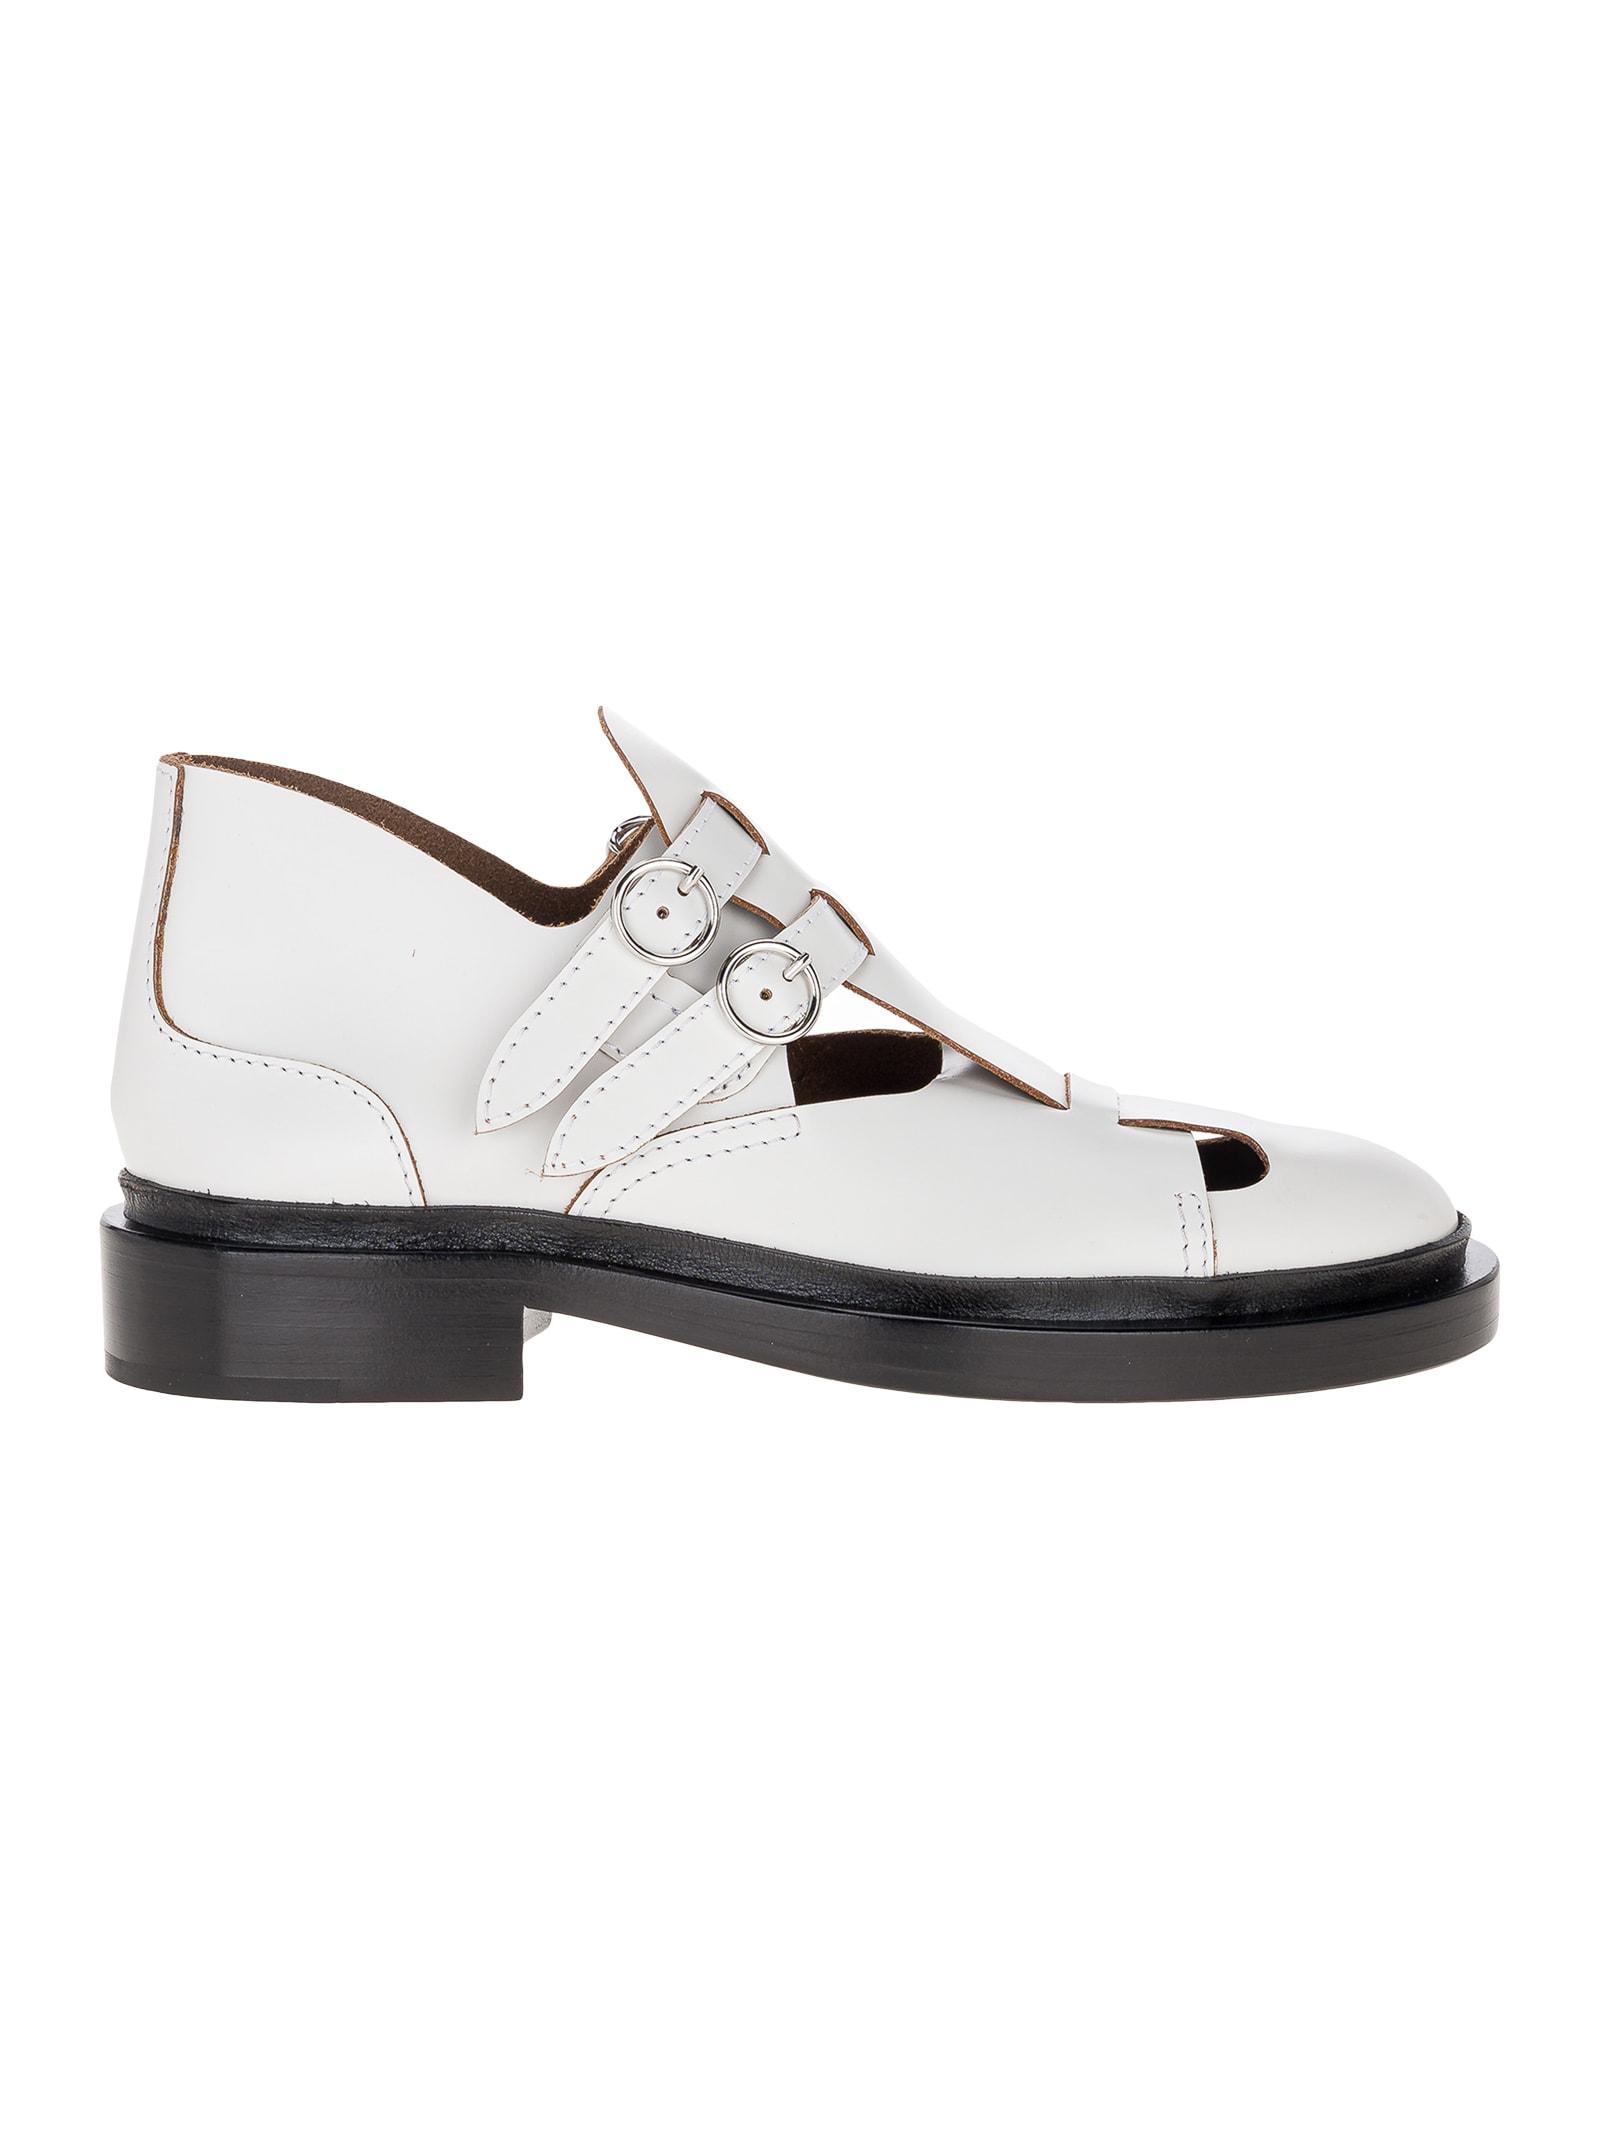 Buy Jil Sander Cut Out Buckle Sandal online, shop Jil Sander shoes with free shipping